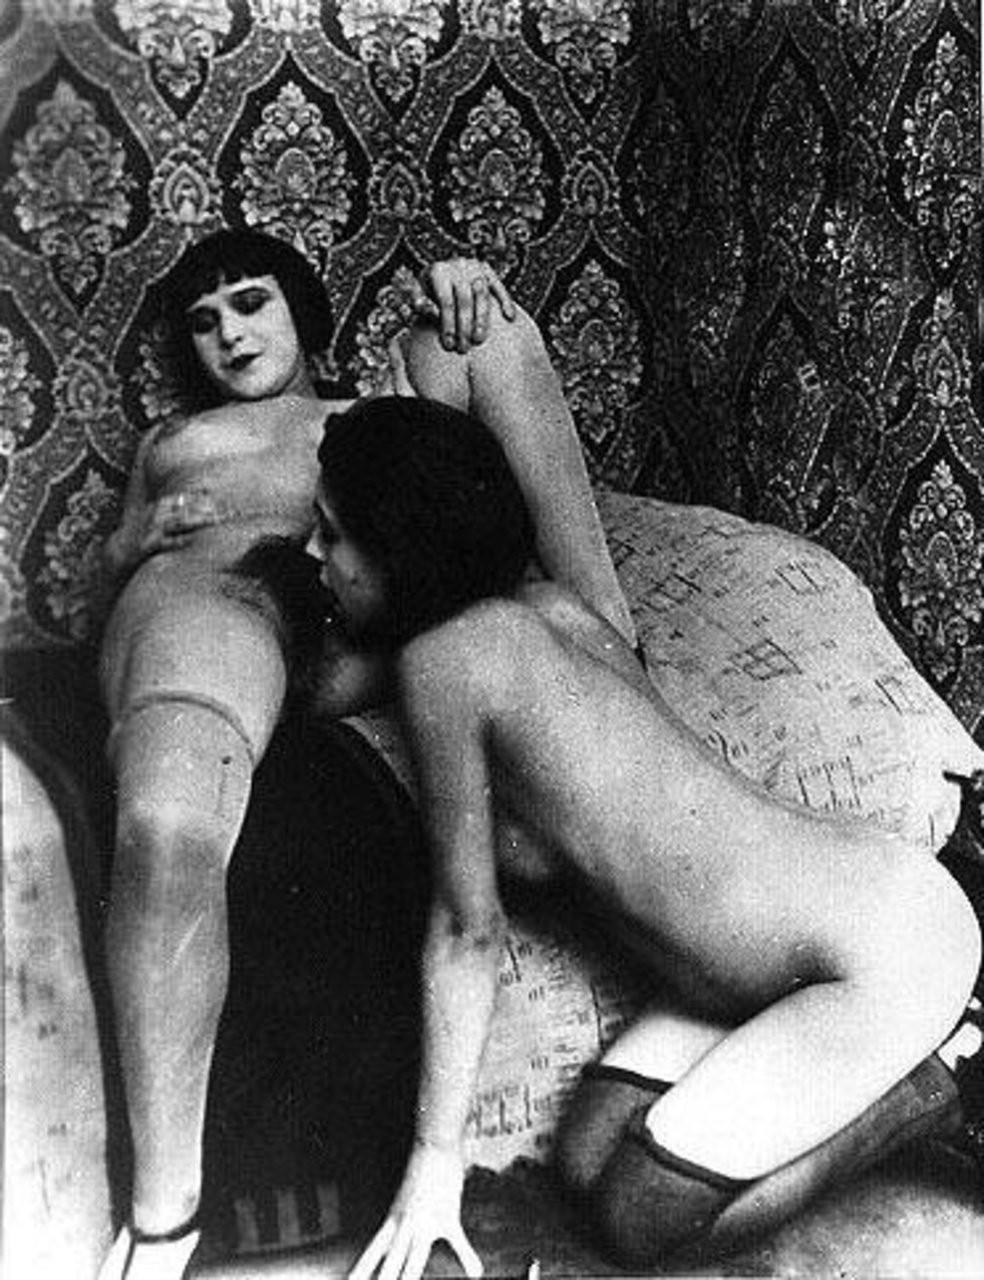 white woman sucking huge cock – Lesbian